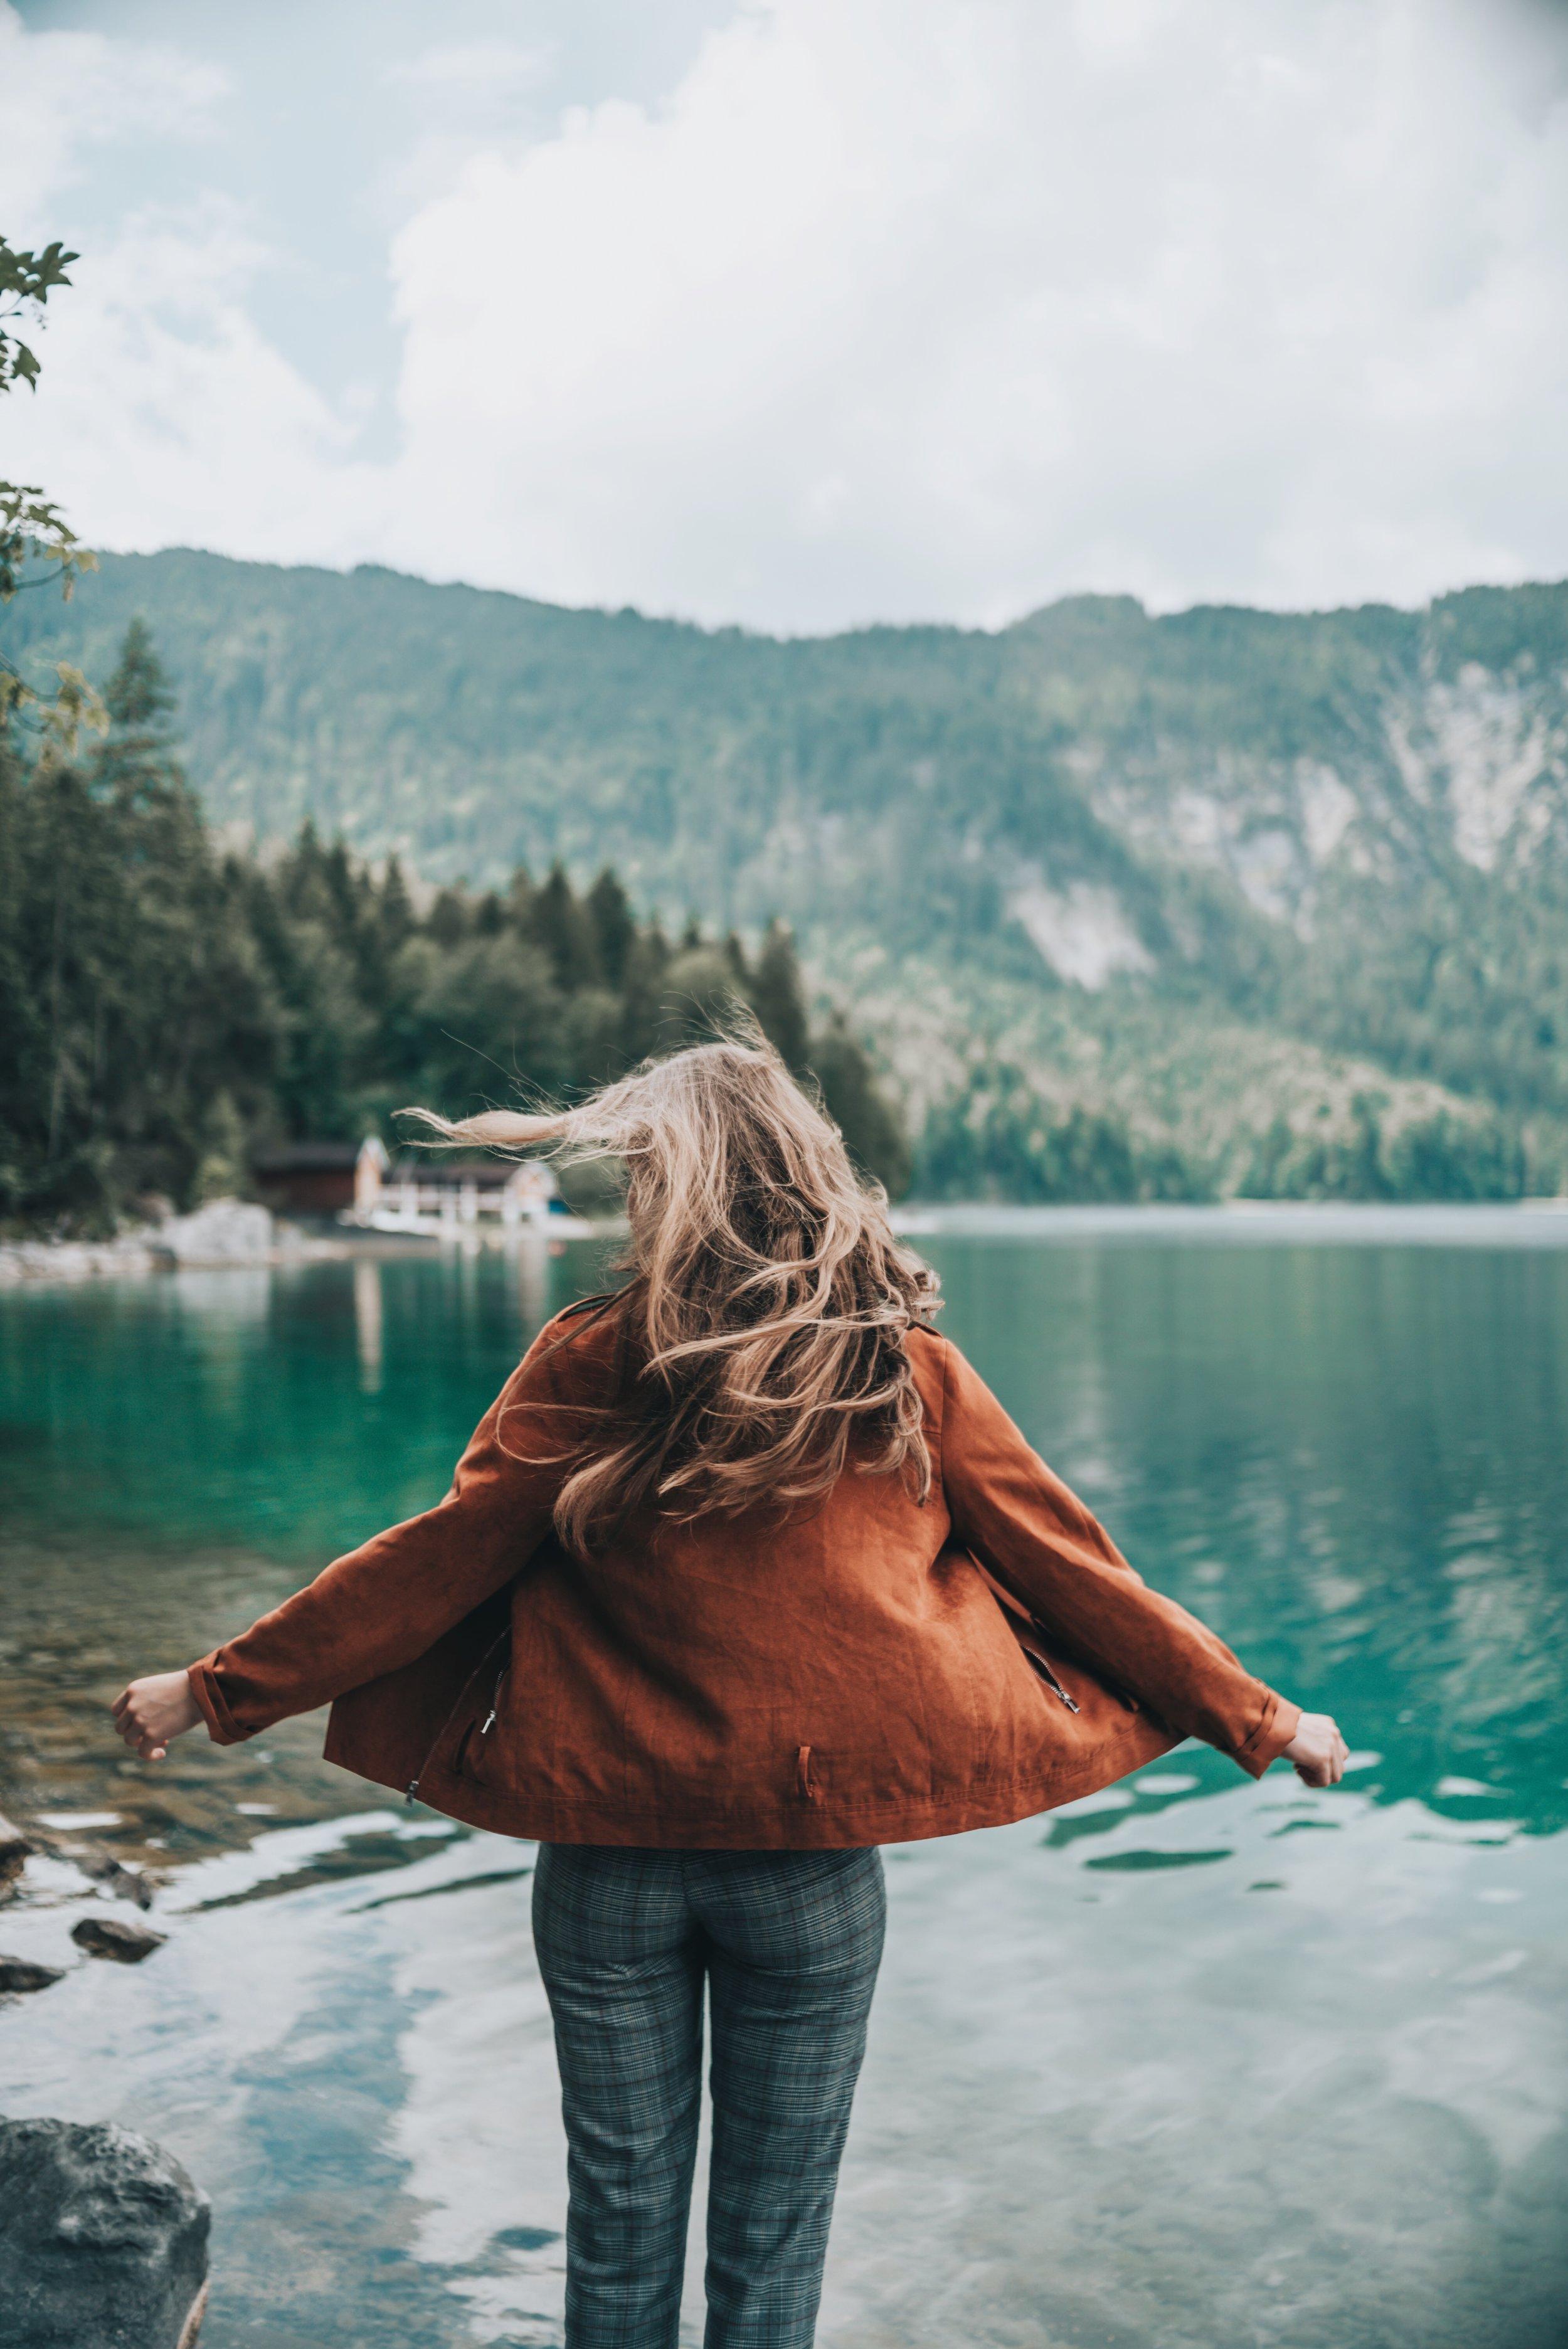 eibsee-bavaria-photography-travel-guide-gretacaptures